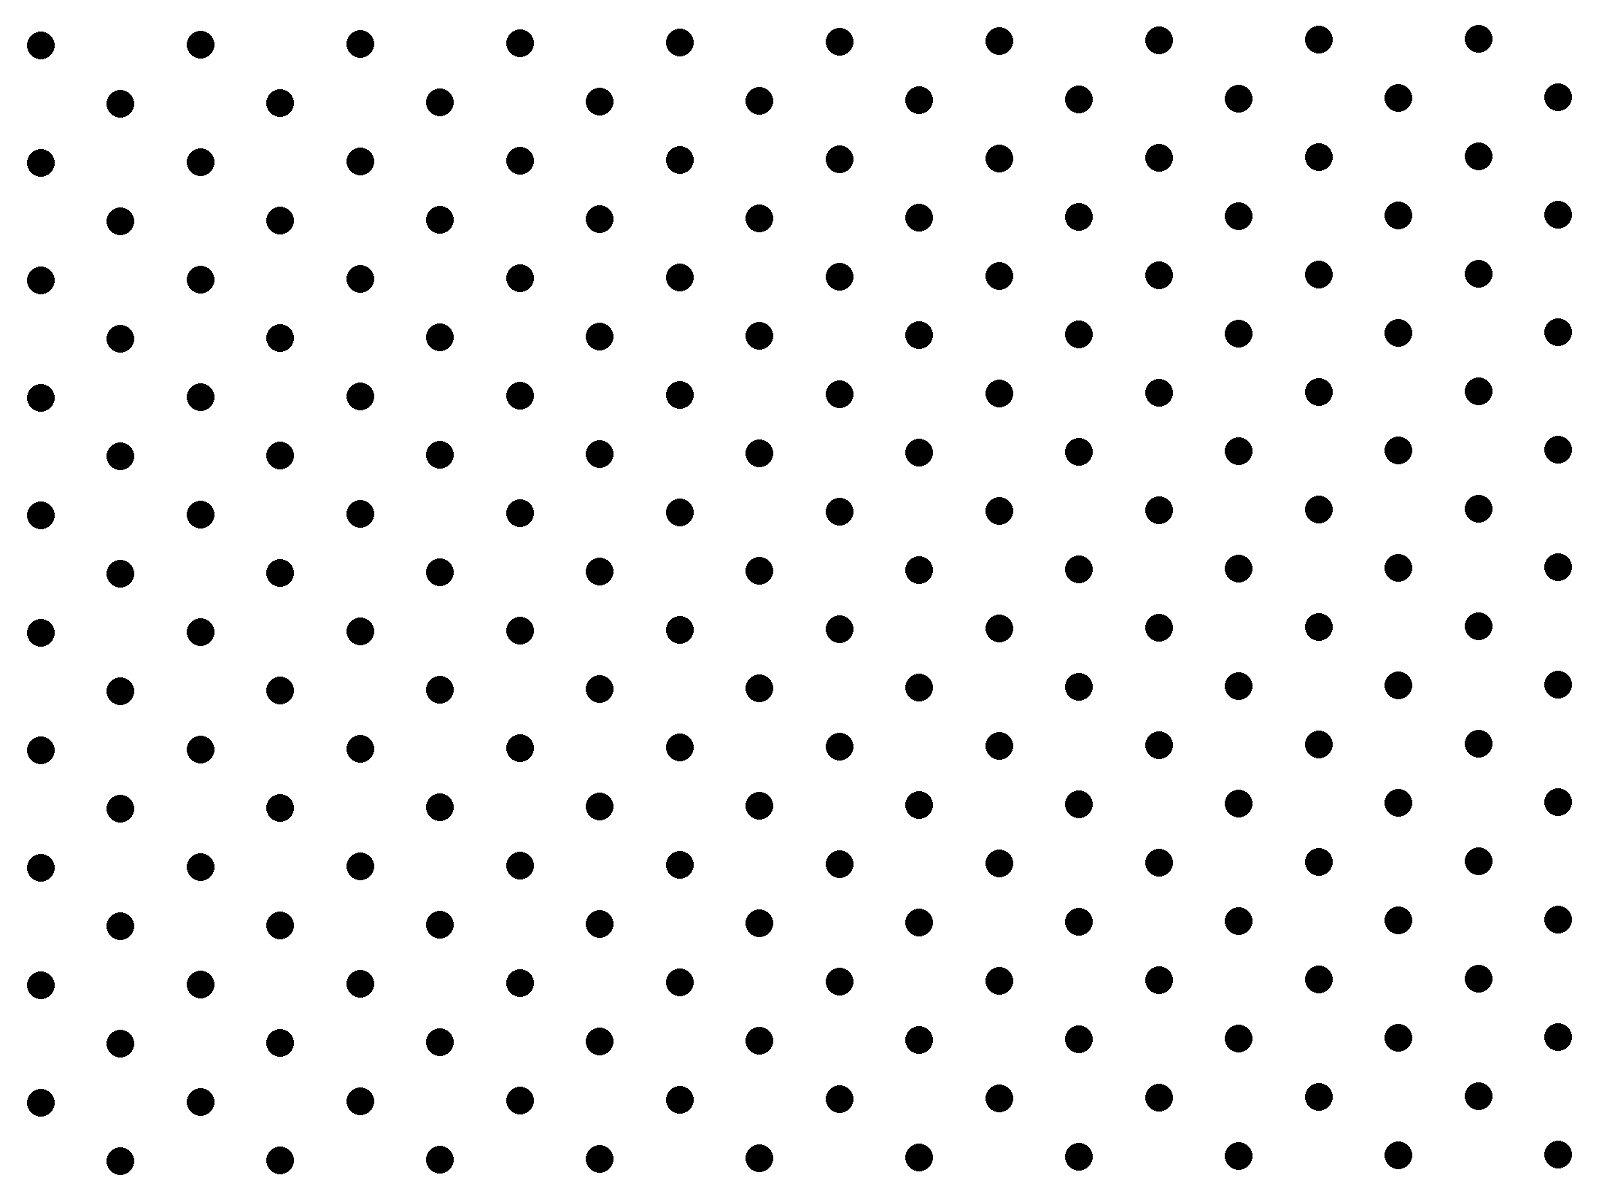 polkadot-background-2012ws